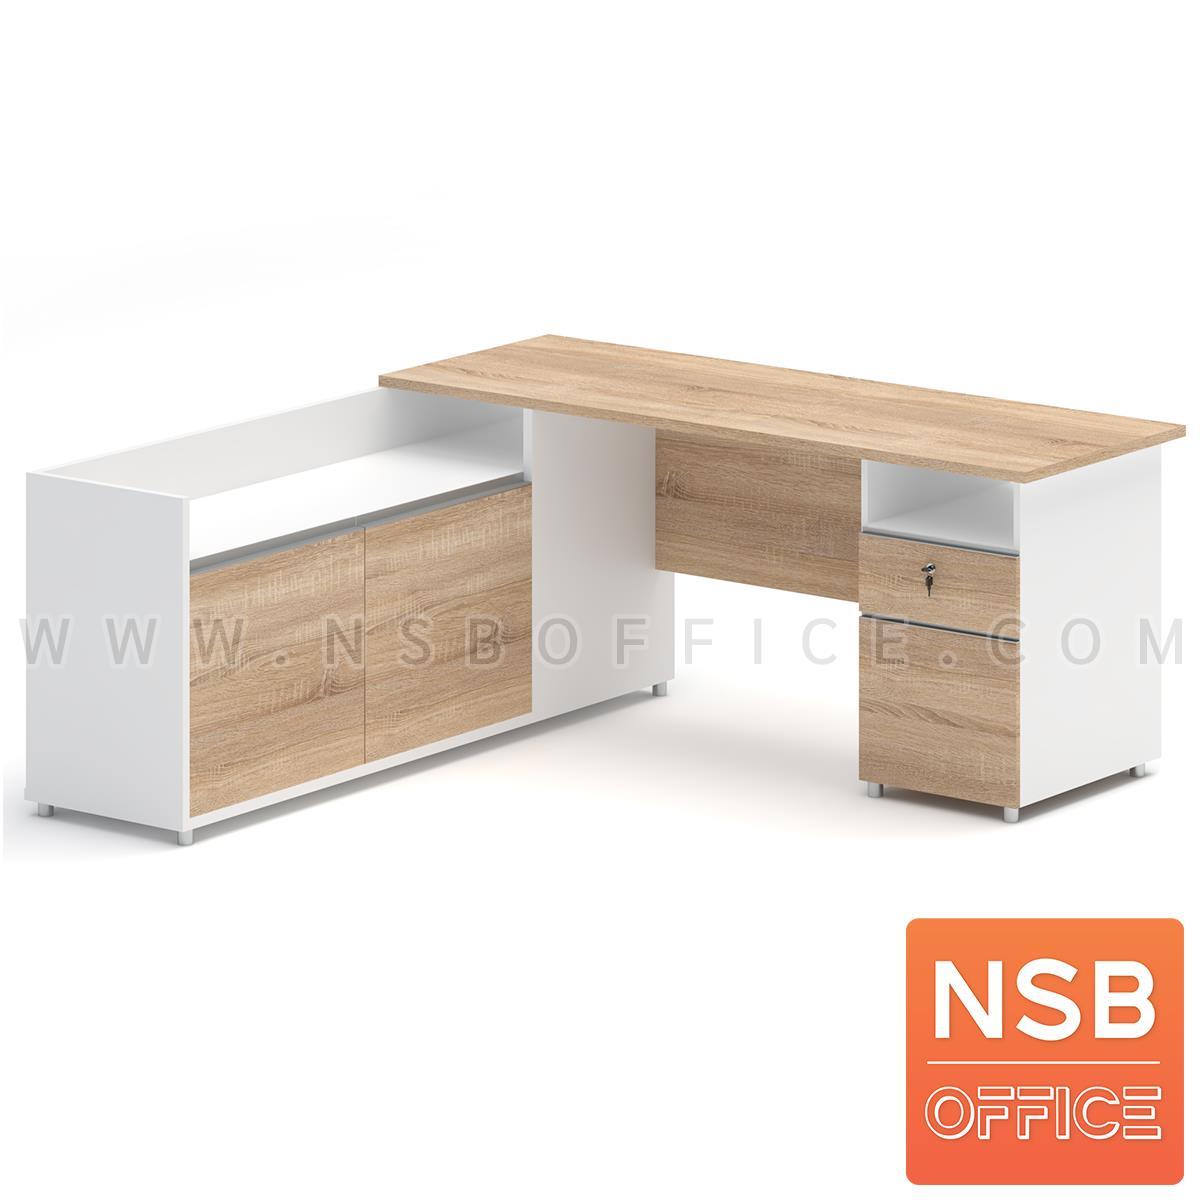 A21A004:โต๊ะทำงานตัวแอล 2 ลิ้นชัก  รุ่น Allsaint (ออลเซ็นต์) ขนาด 180W1*179W2 cm. เมลามีน สีเนเจอร์ทีค-ขาว